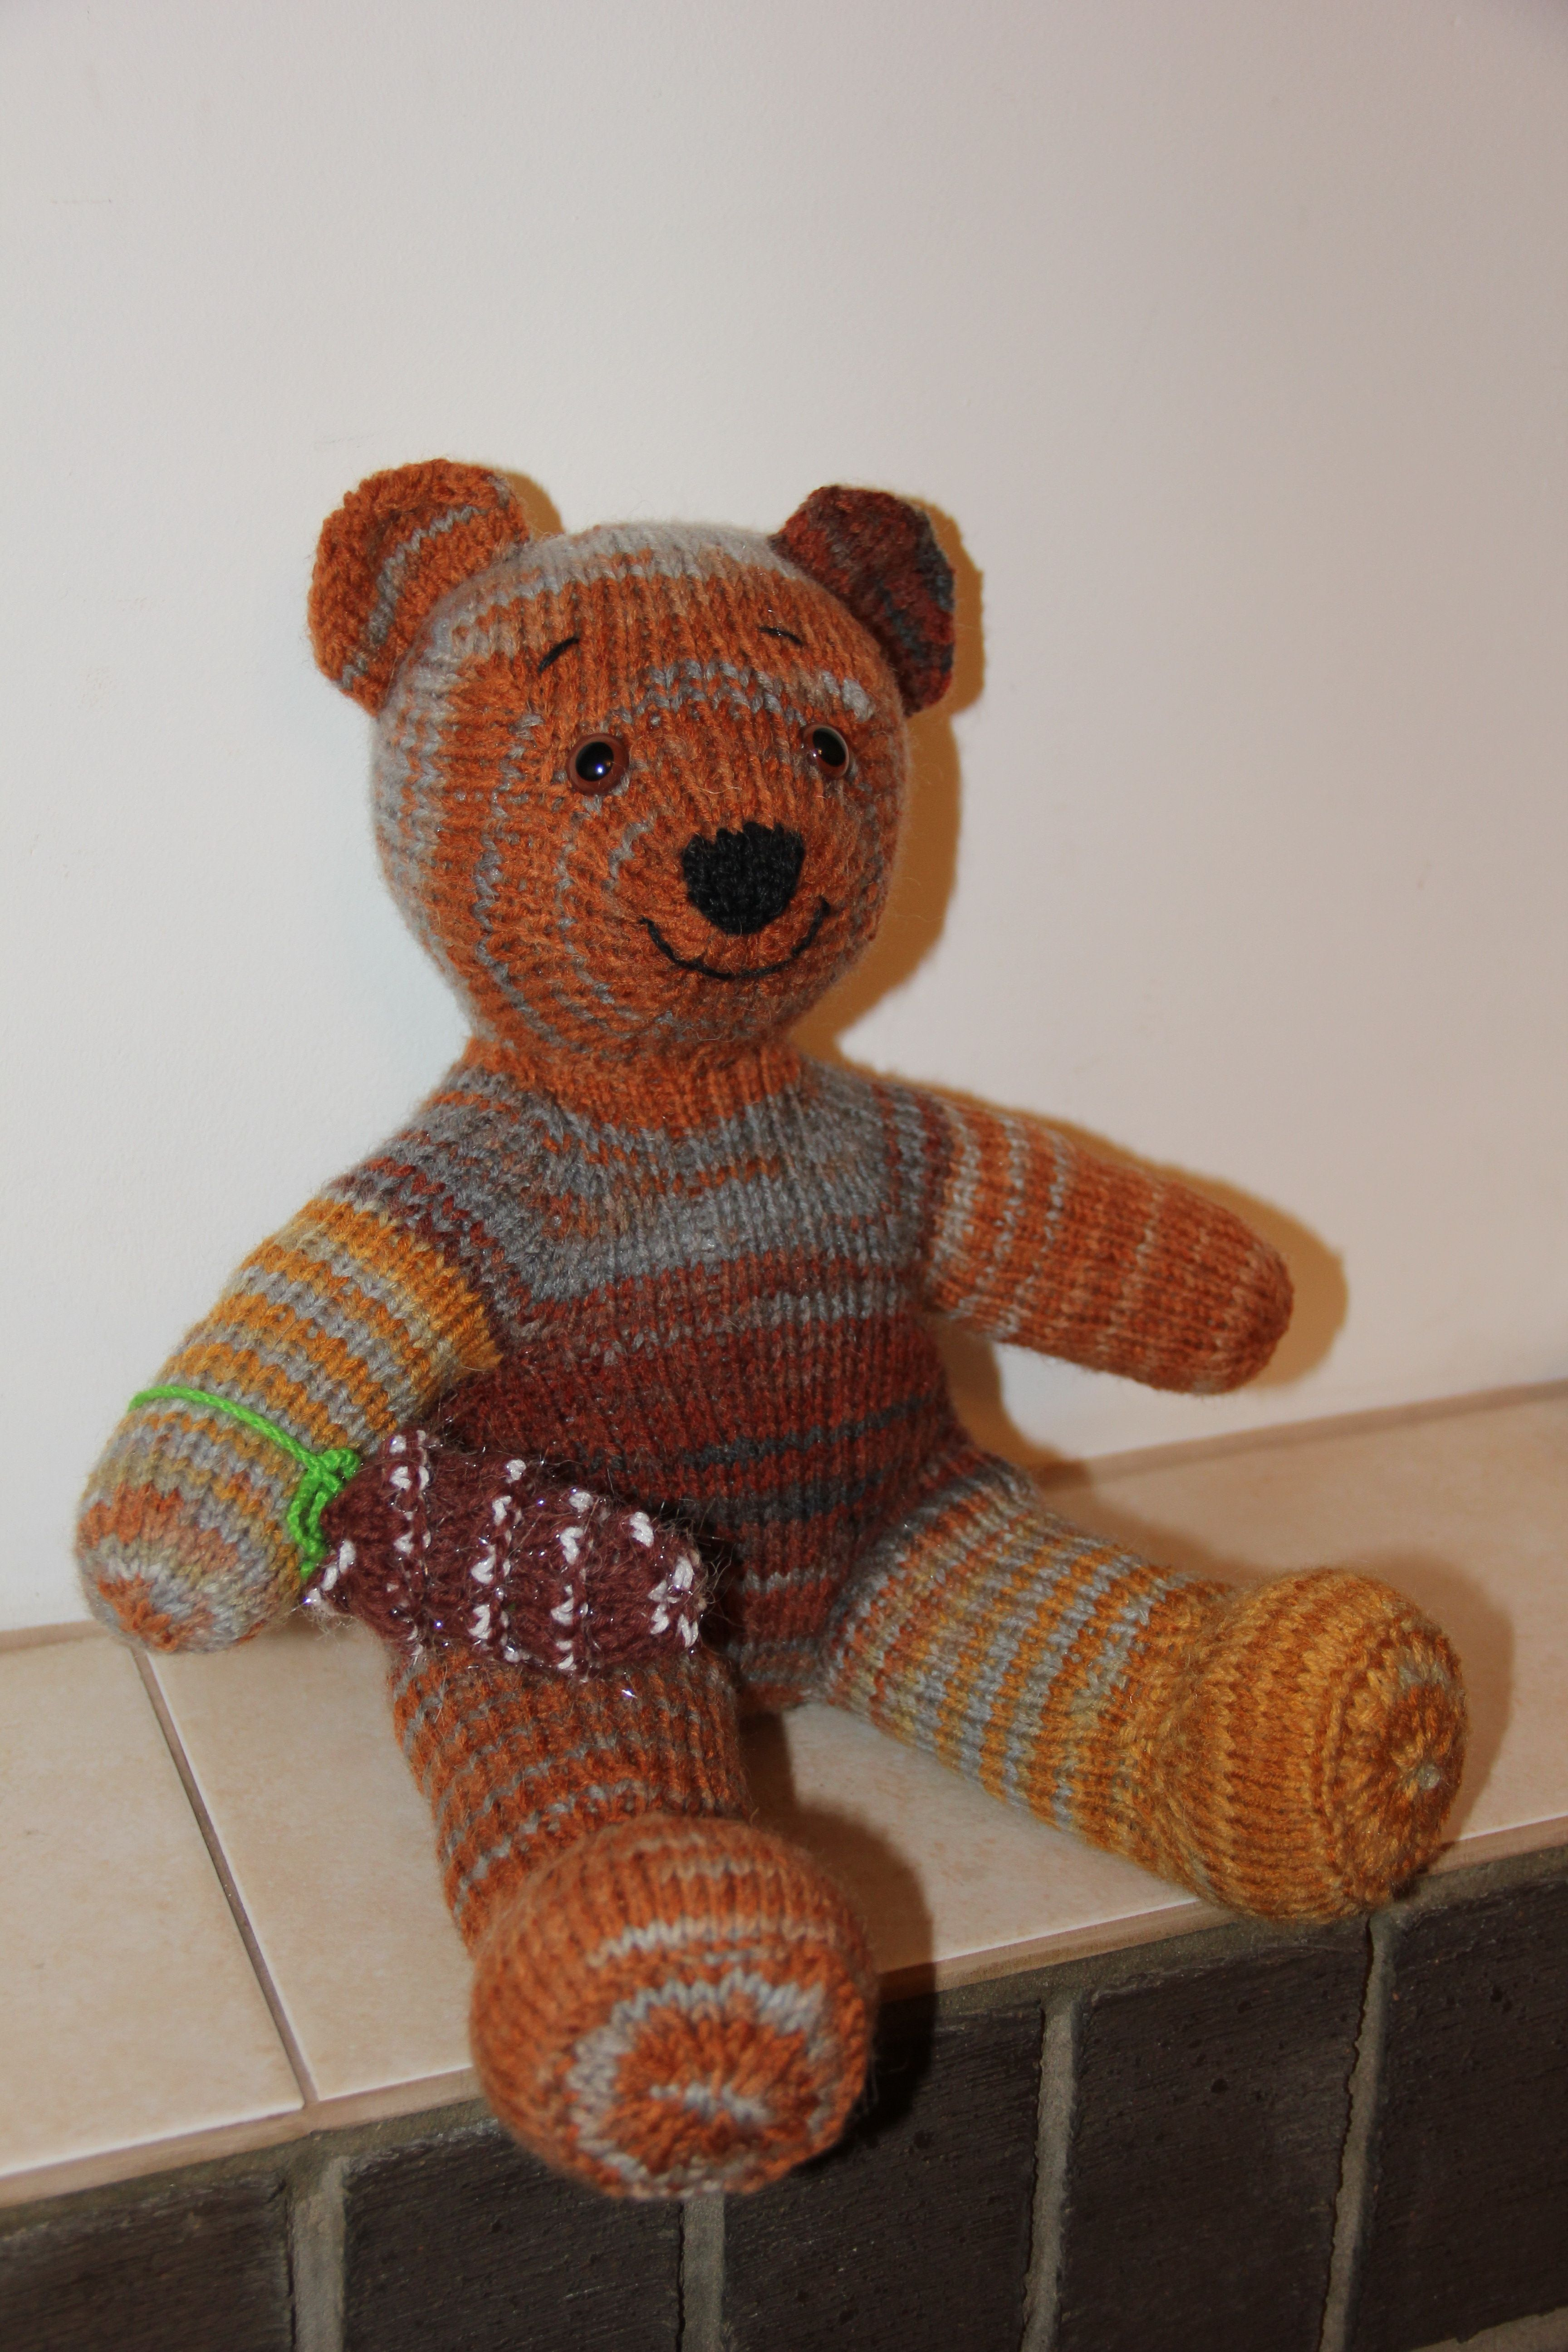 Cute Toy Teddy Bear Gift For 123 Year Old Baby Realistic Etsy Teddy Bear Gifts Bear Toy Knitted Teddy Bear